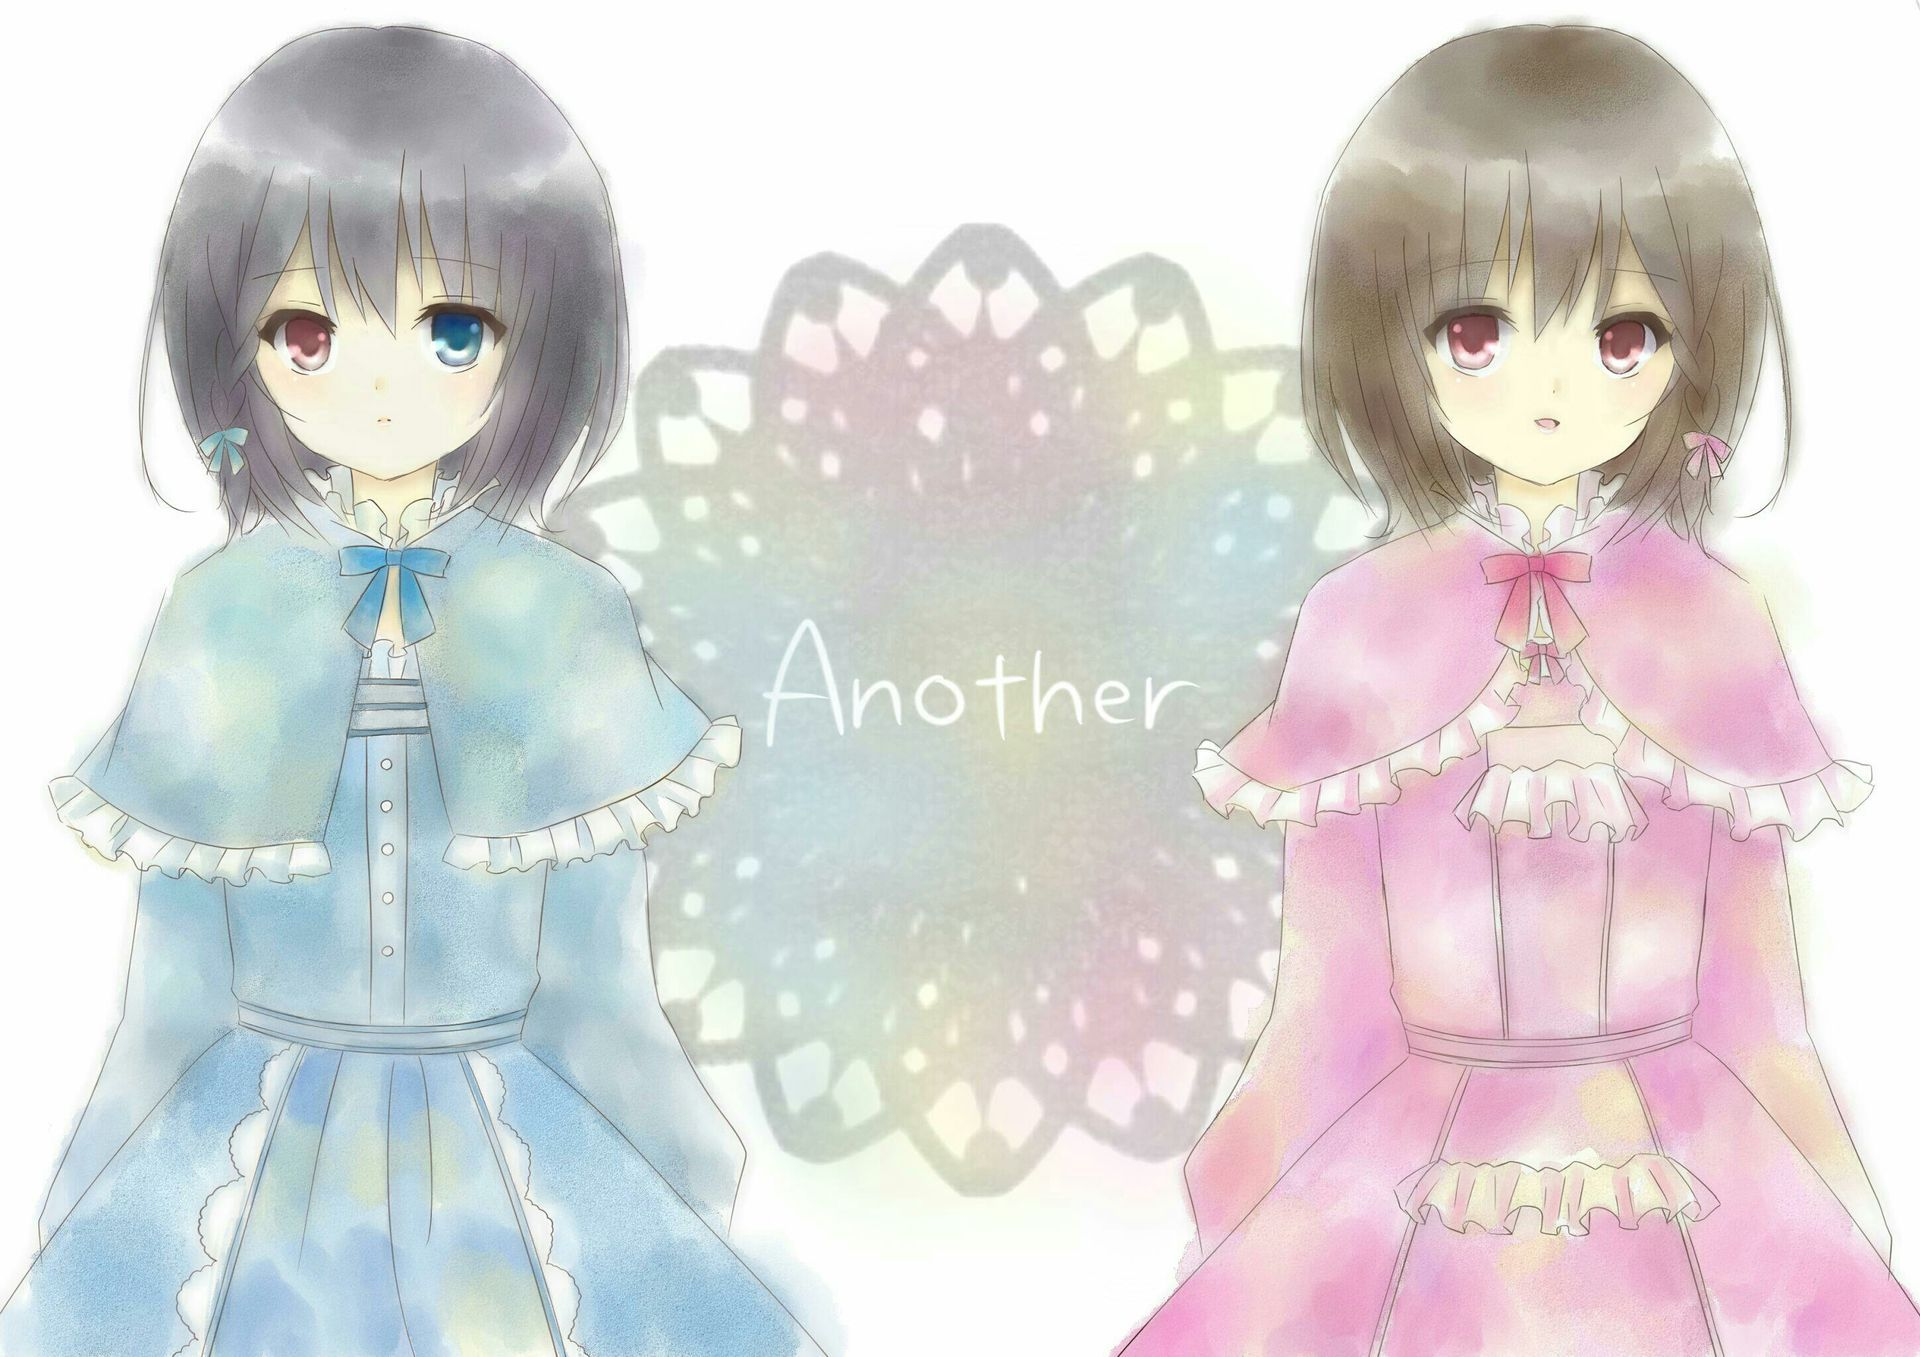 kumpulan Gambar Anime Jepang [ Req Off Sementara